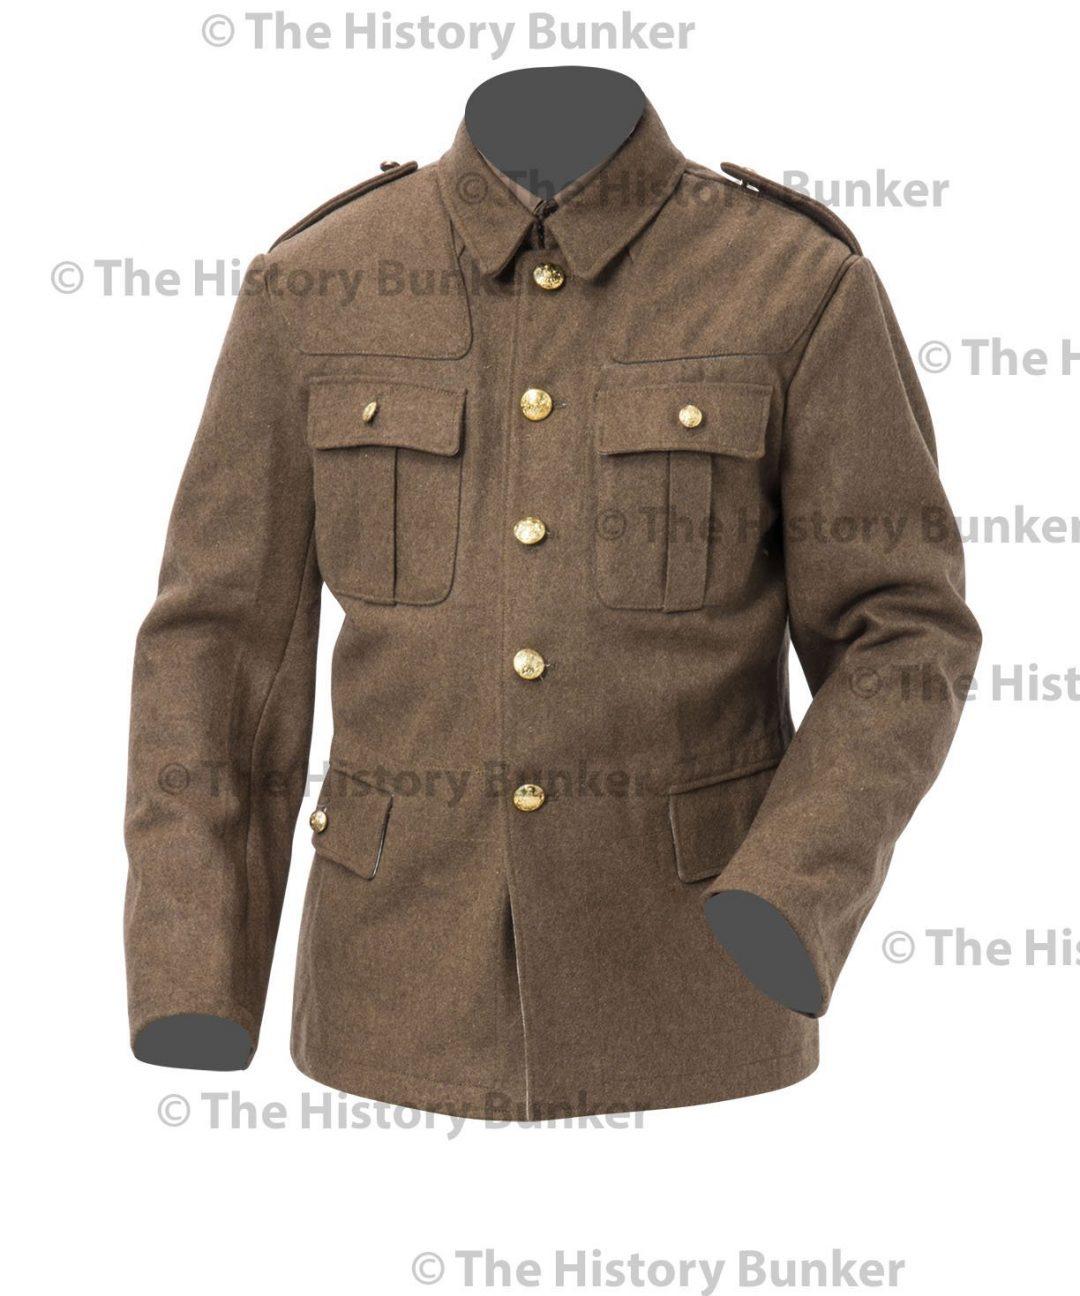 WW1 British army 02 tunic